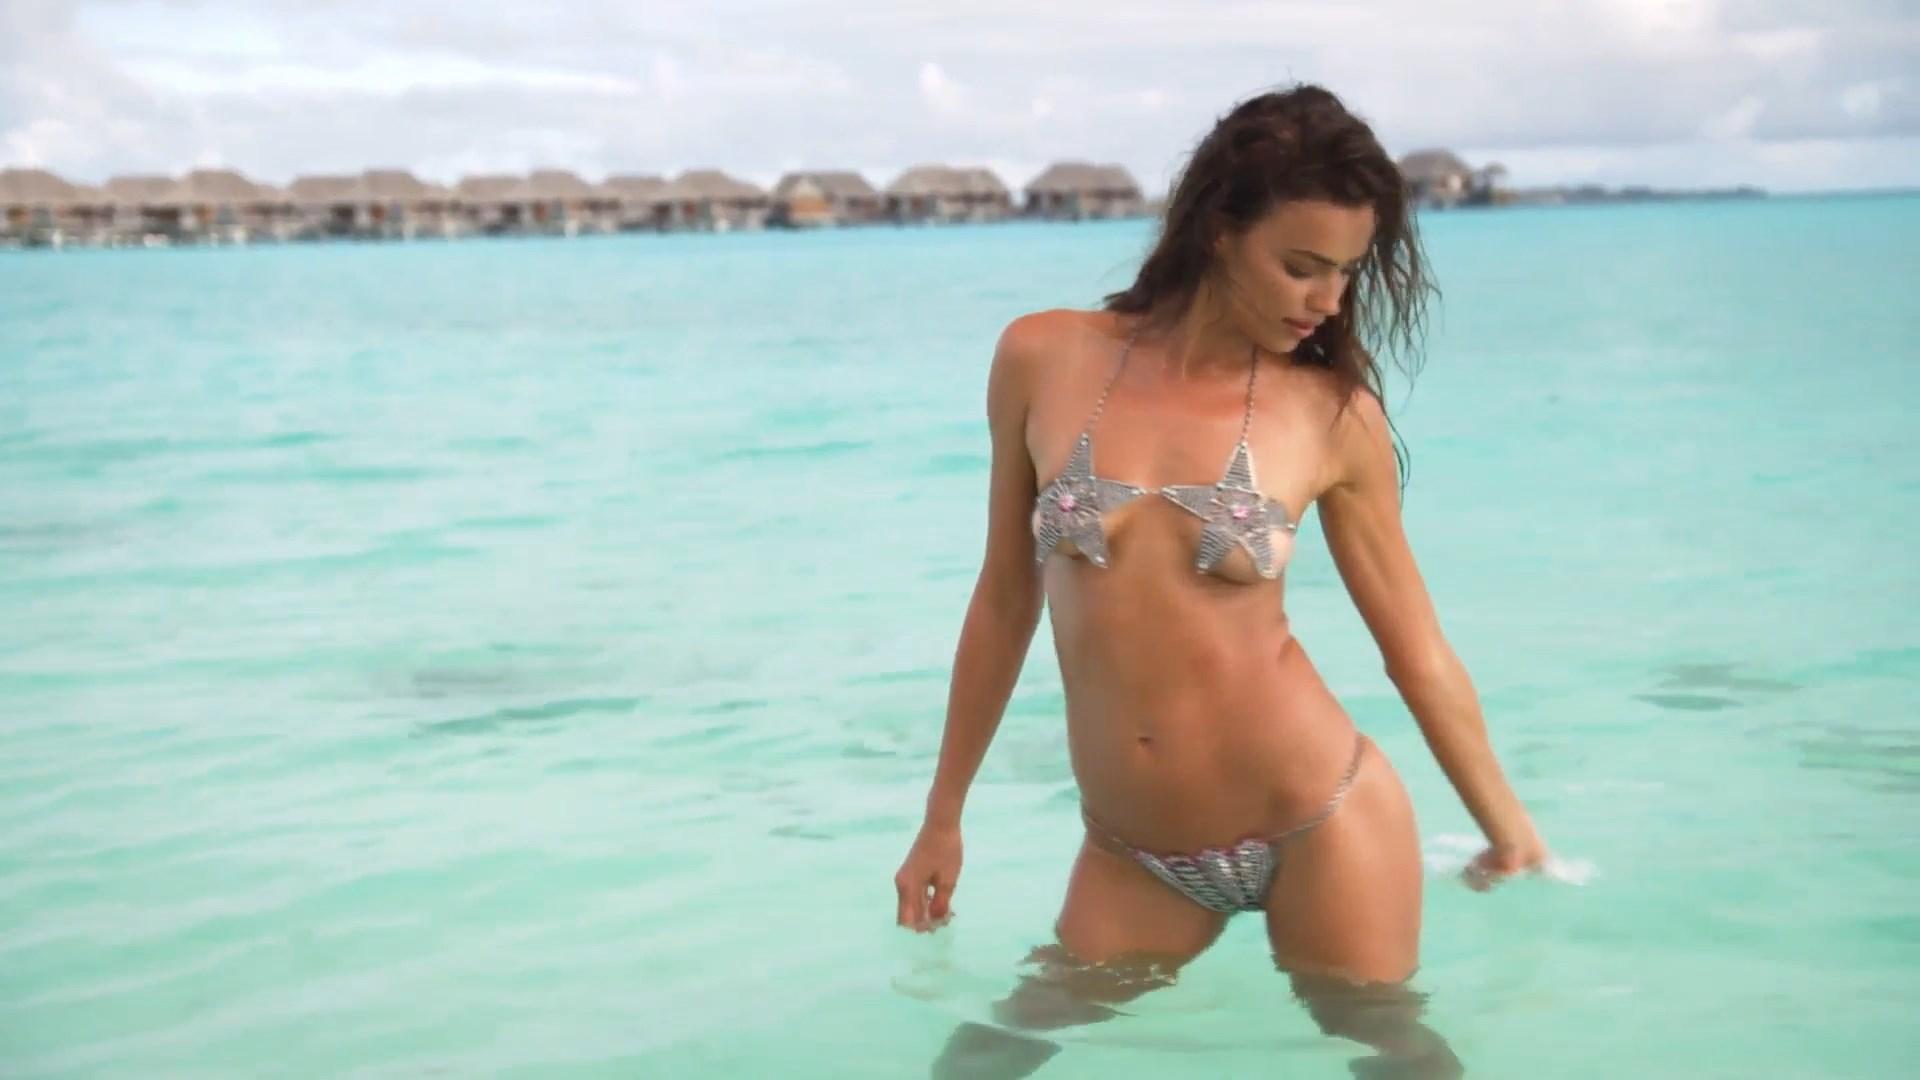 Irina Shayk pussy showing